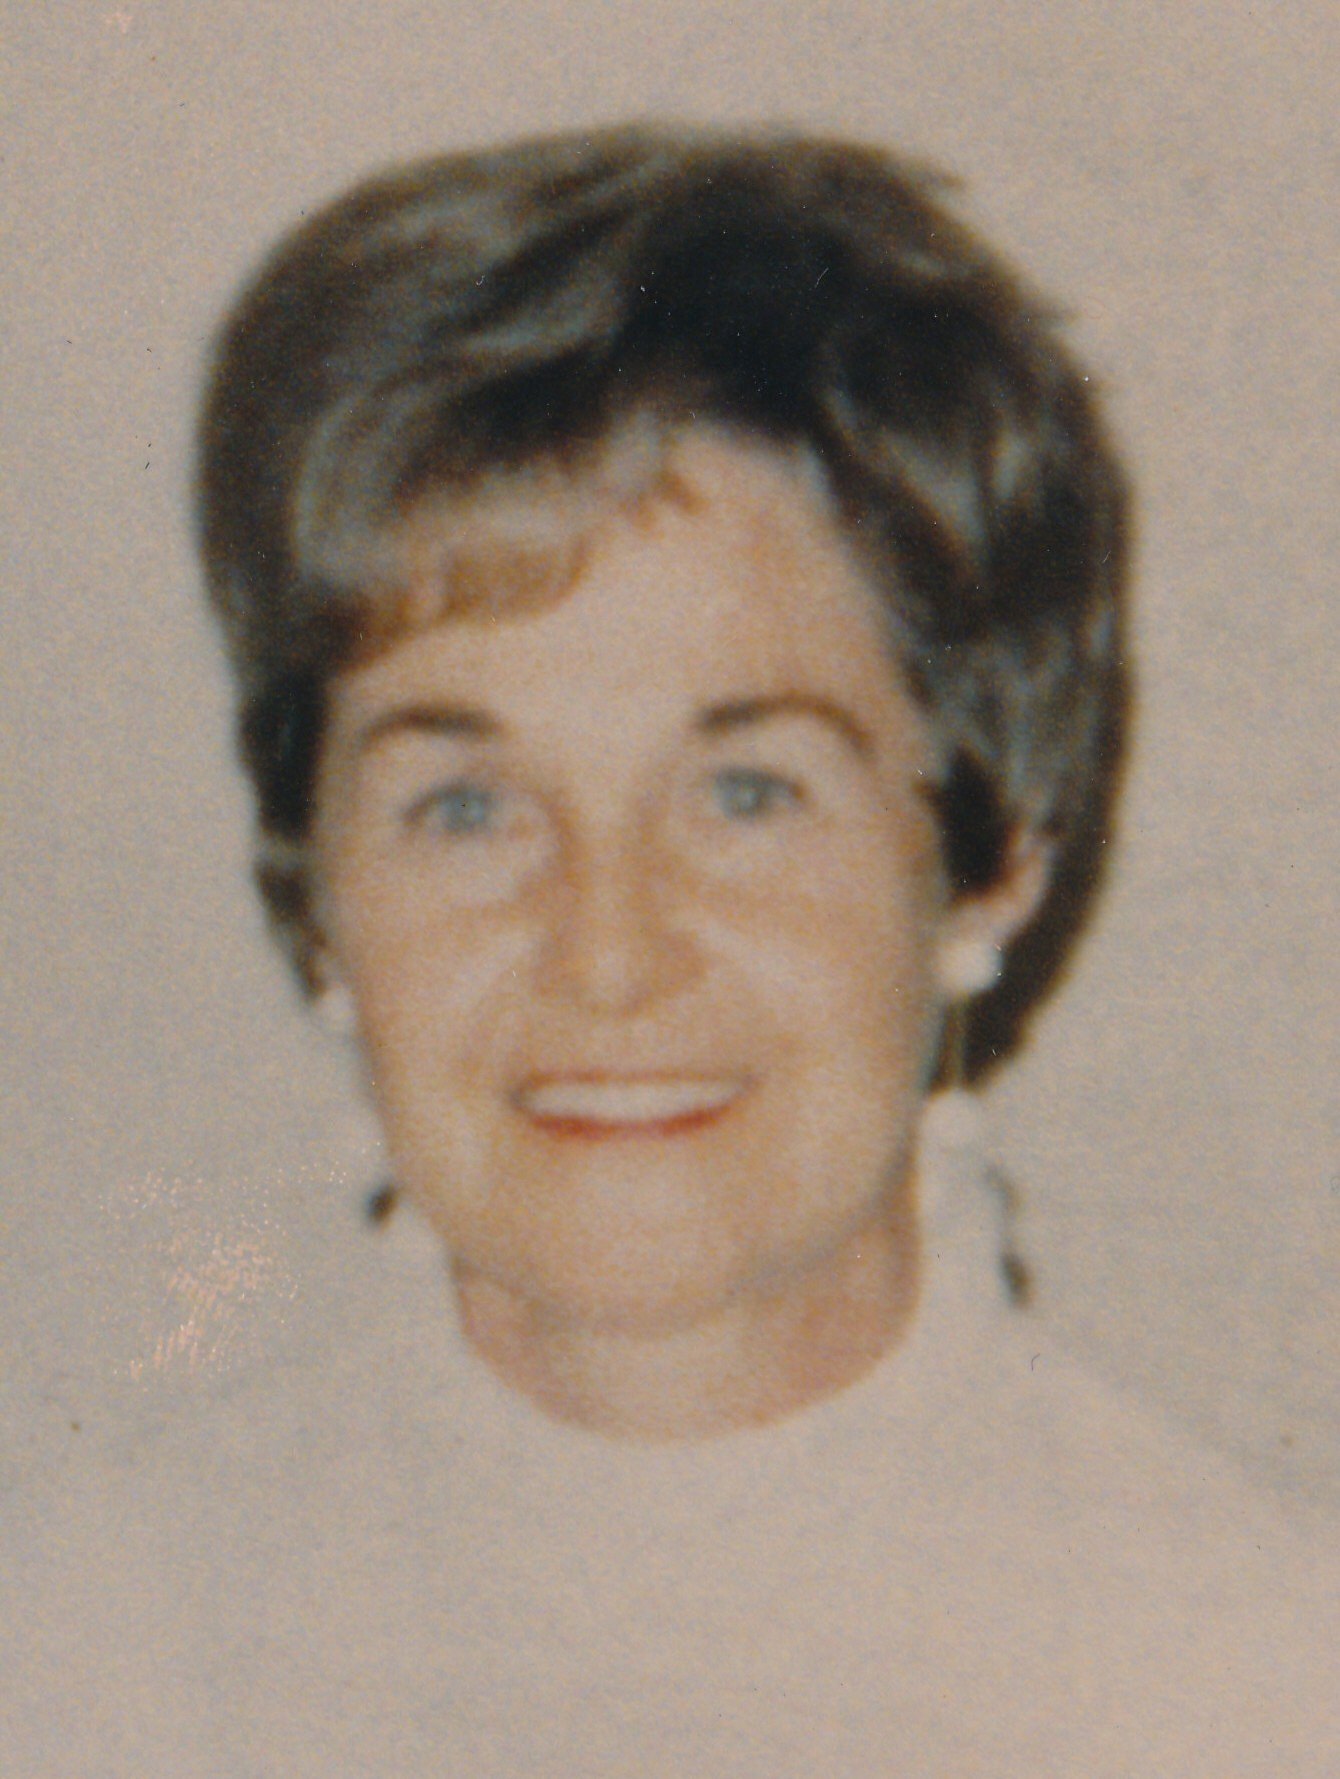 Communication on this topic: Una Stubbs (born 1937), leona-roberts/